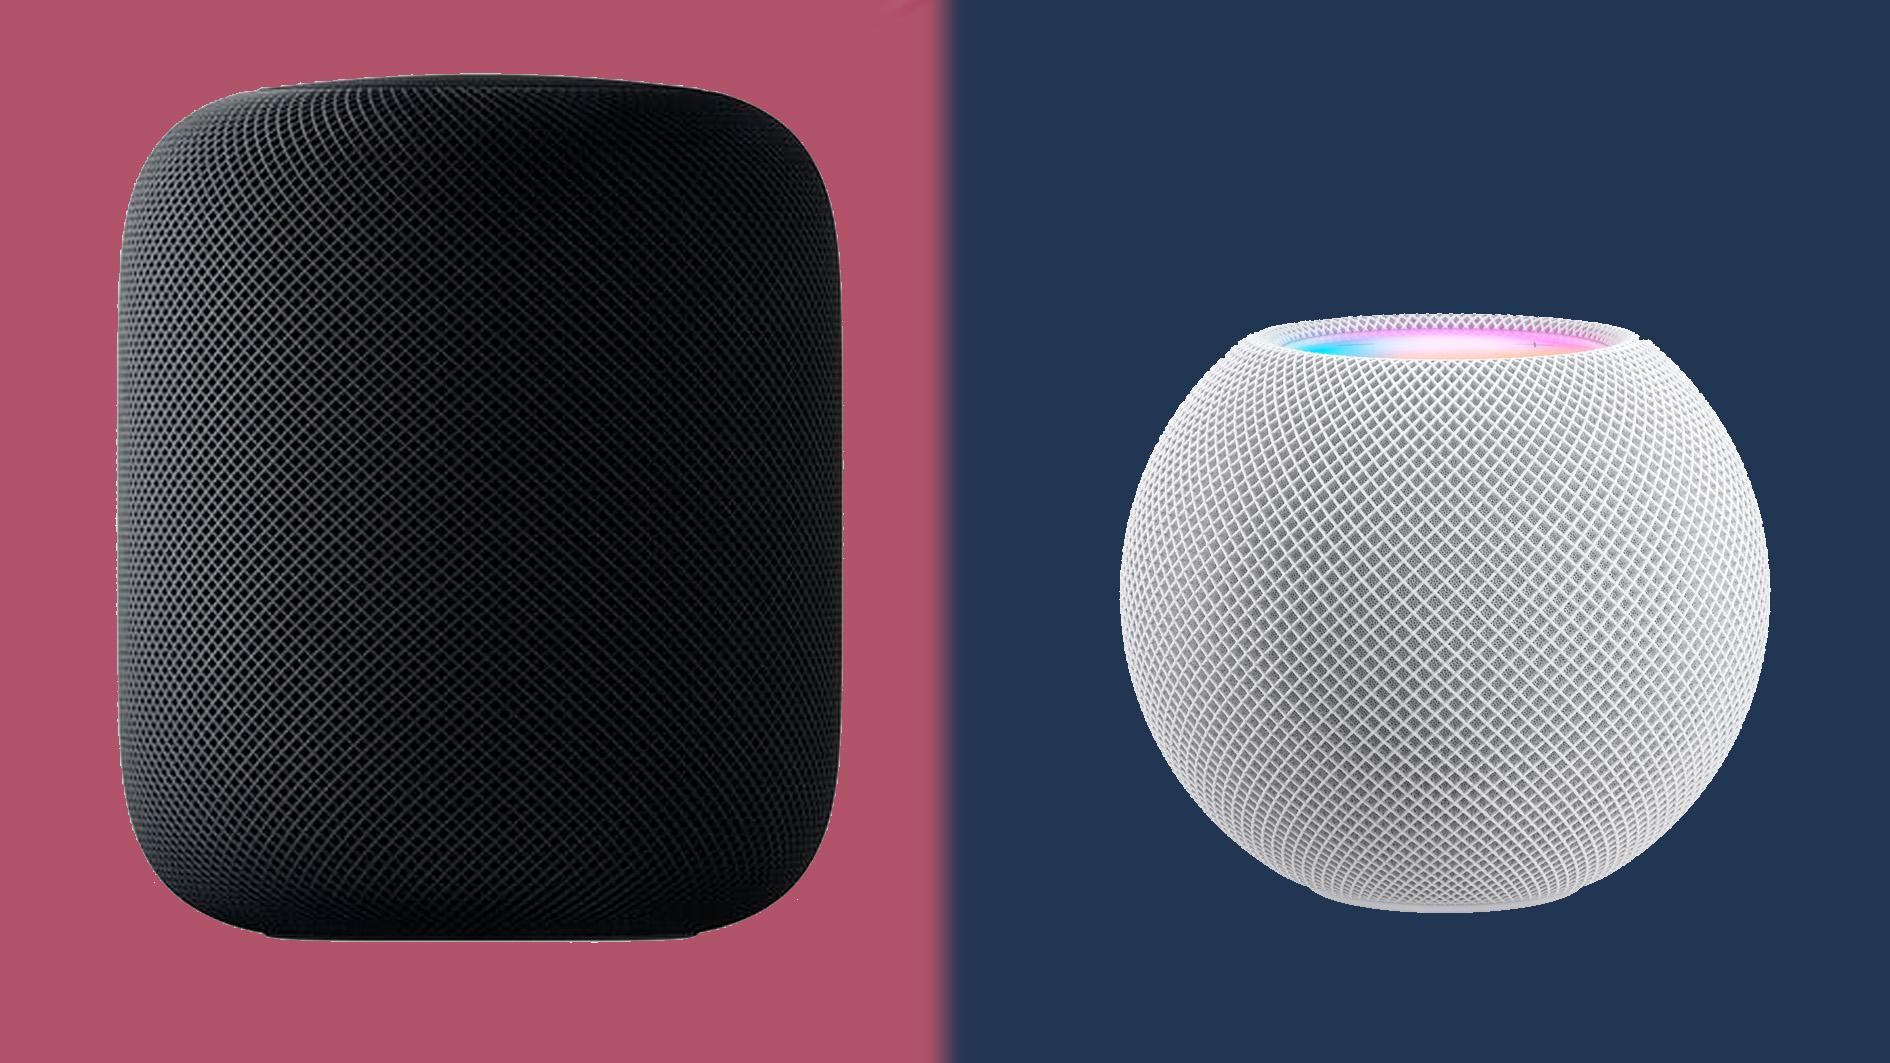 apple homepod mini vs apple homepod